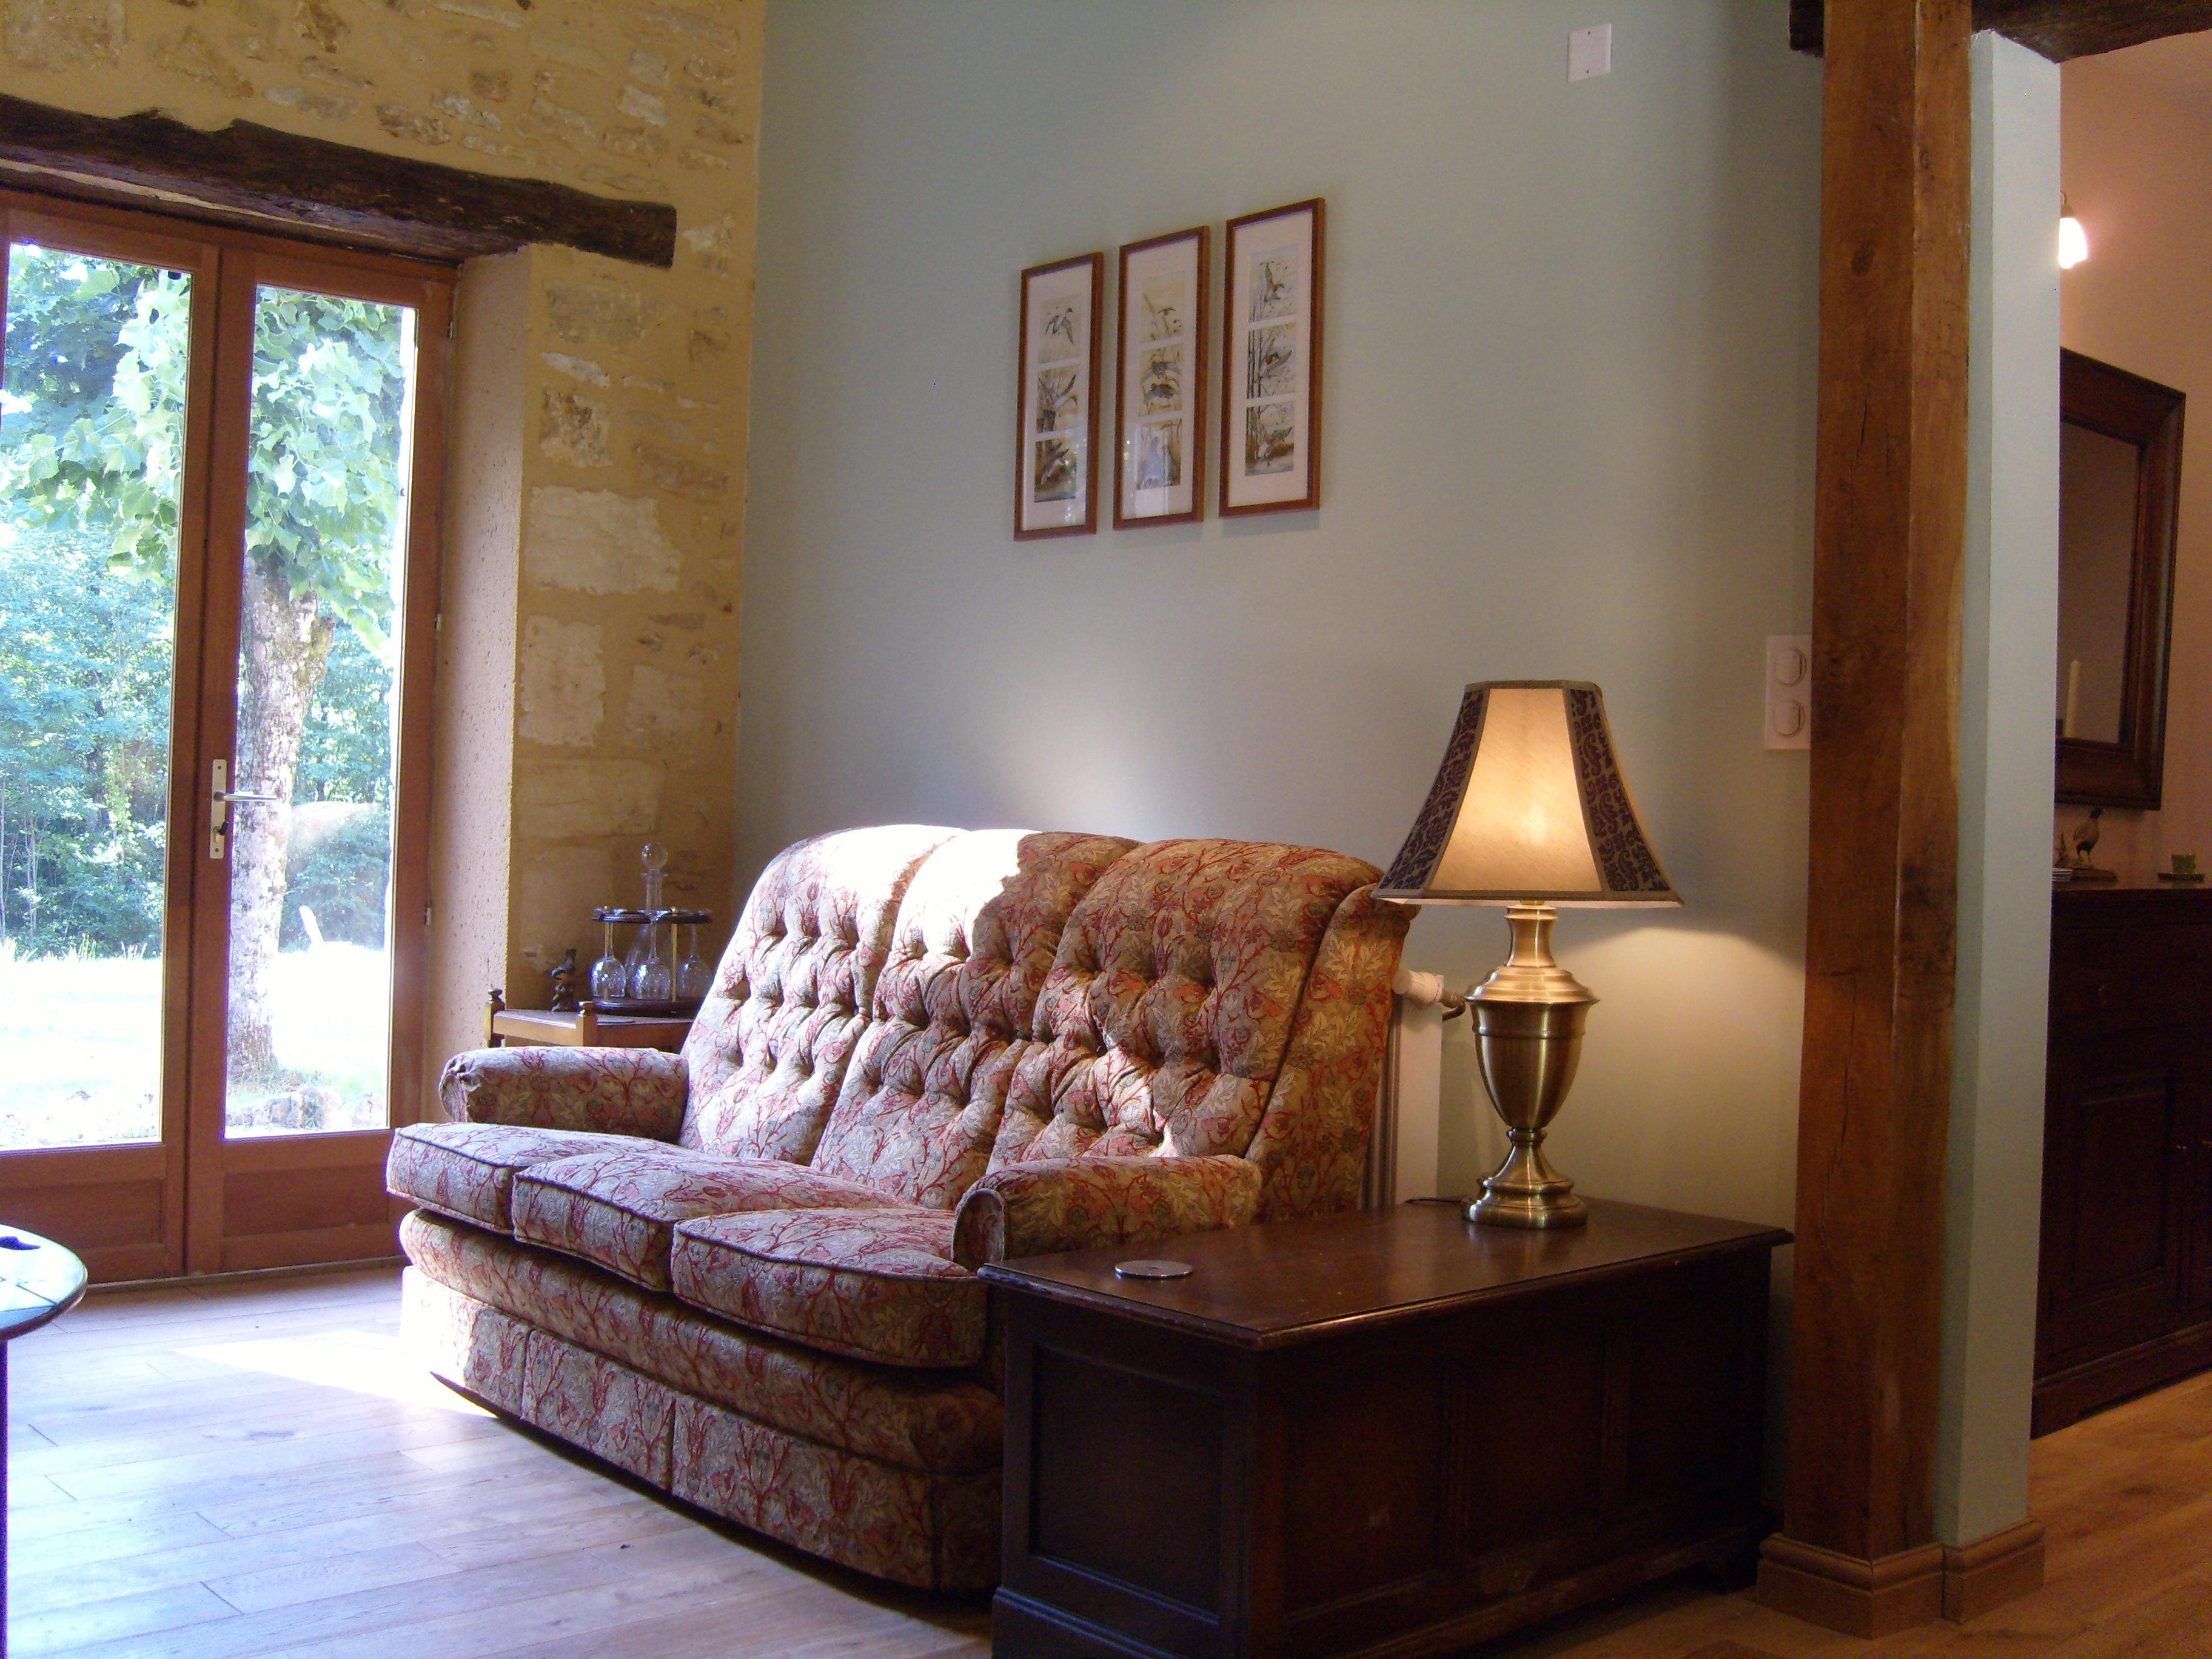 les bressettes living room